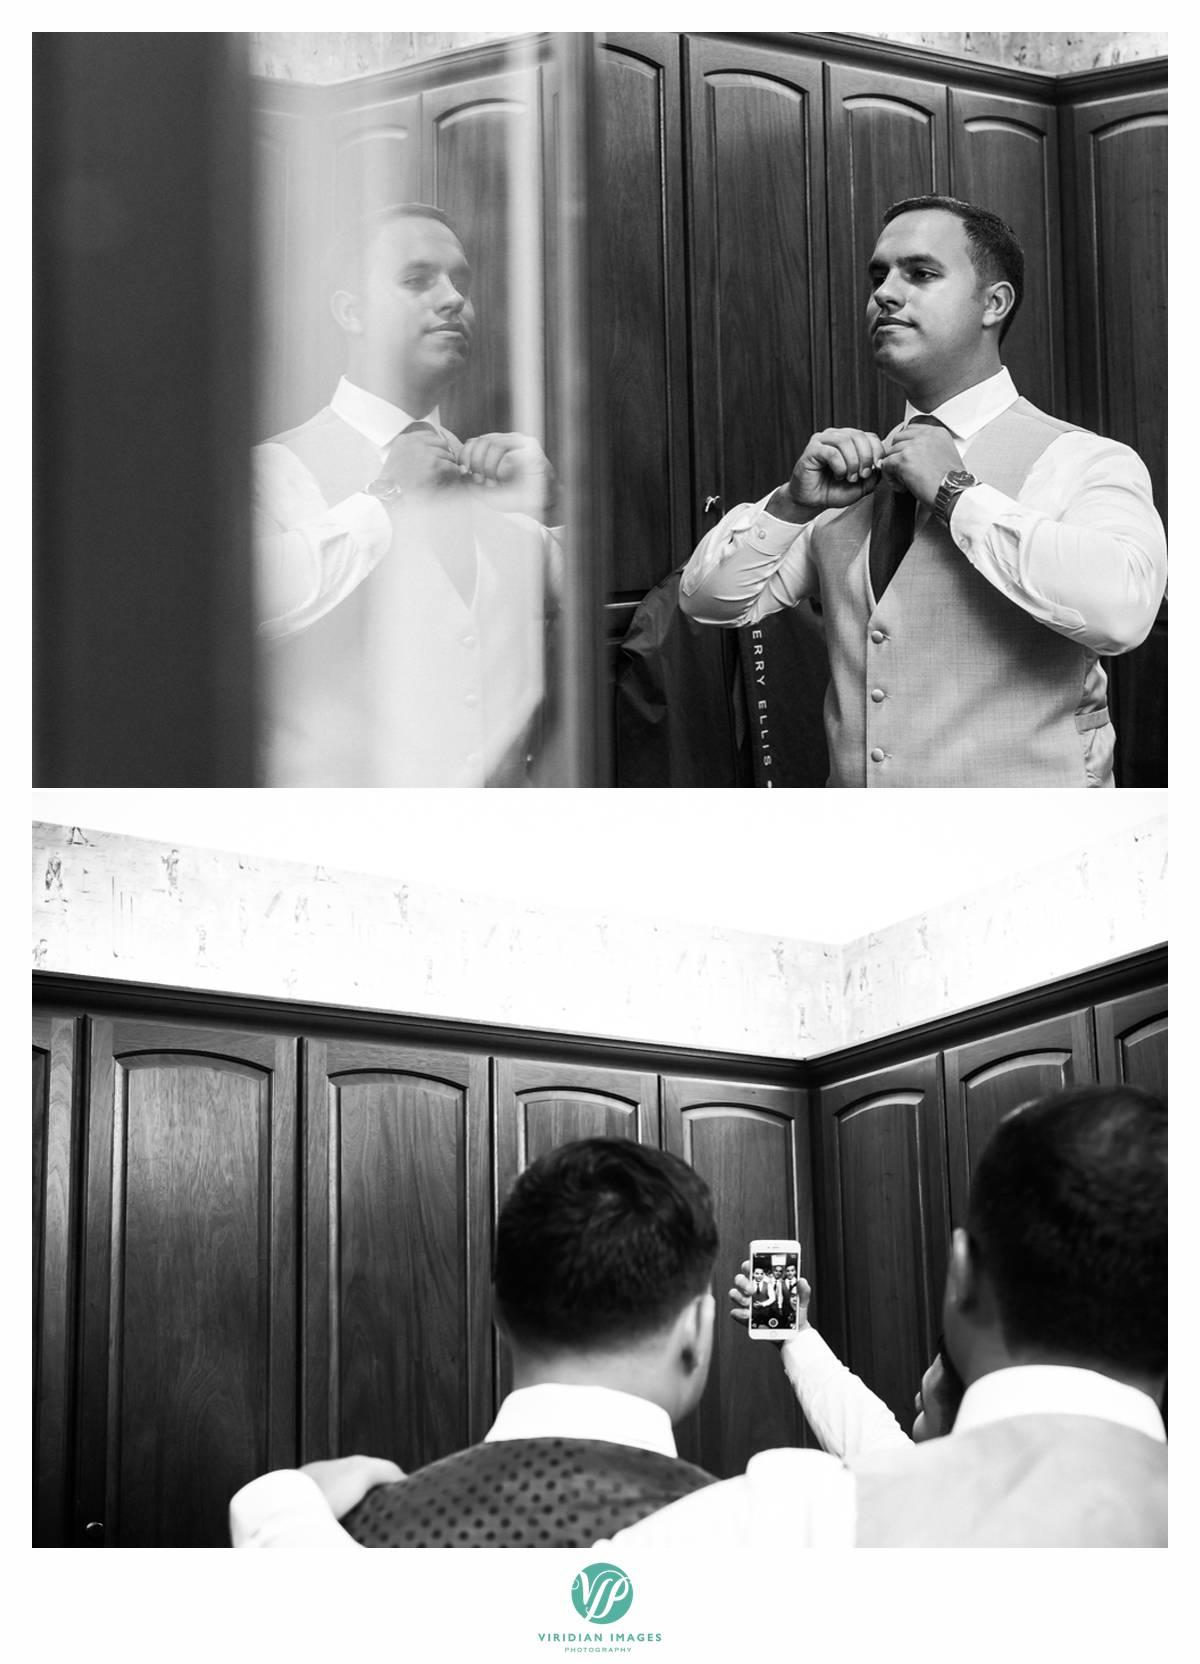 Hilton-Head-Callawassie-Club-Wedding-Viridian-Images-Photography-photo 8